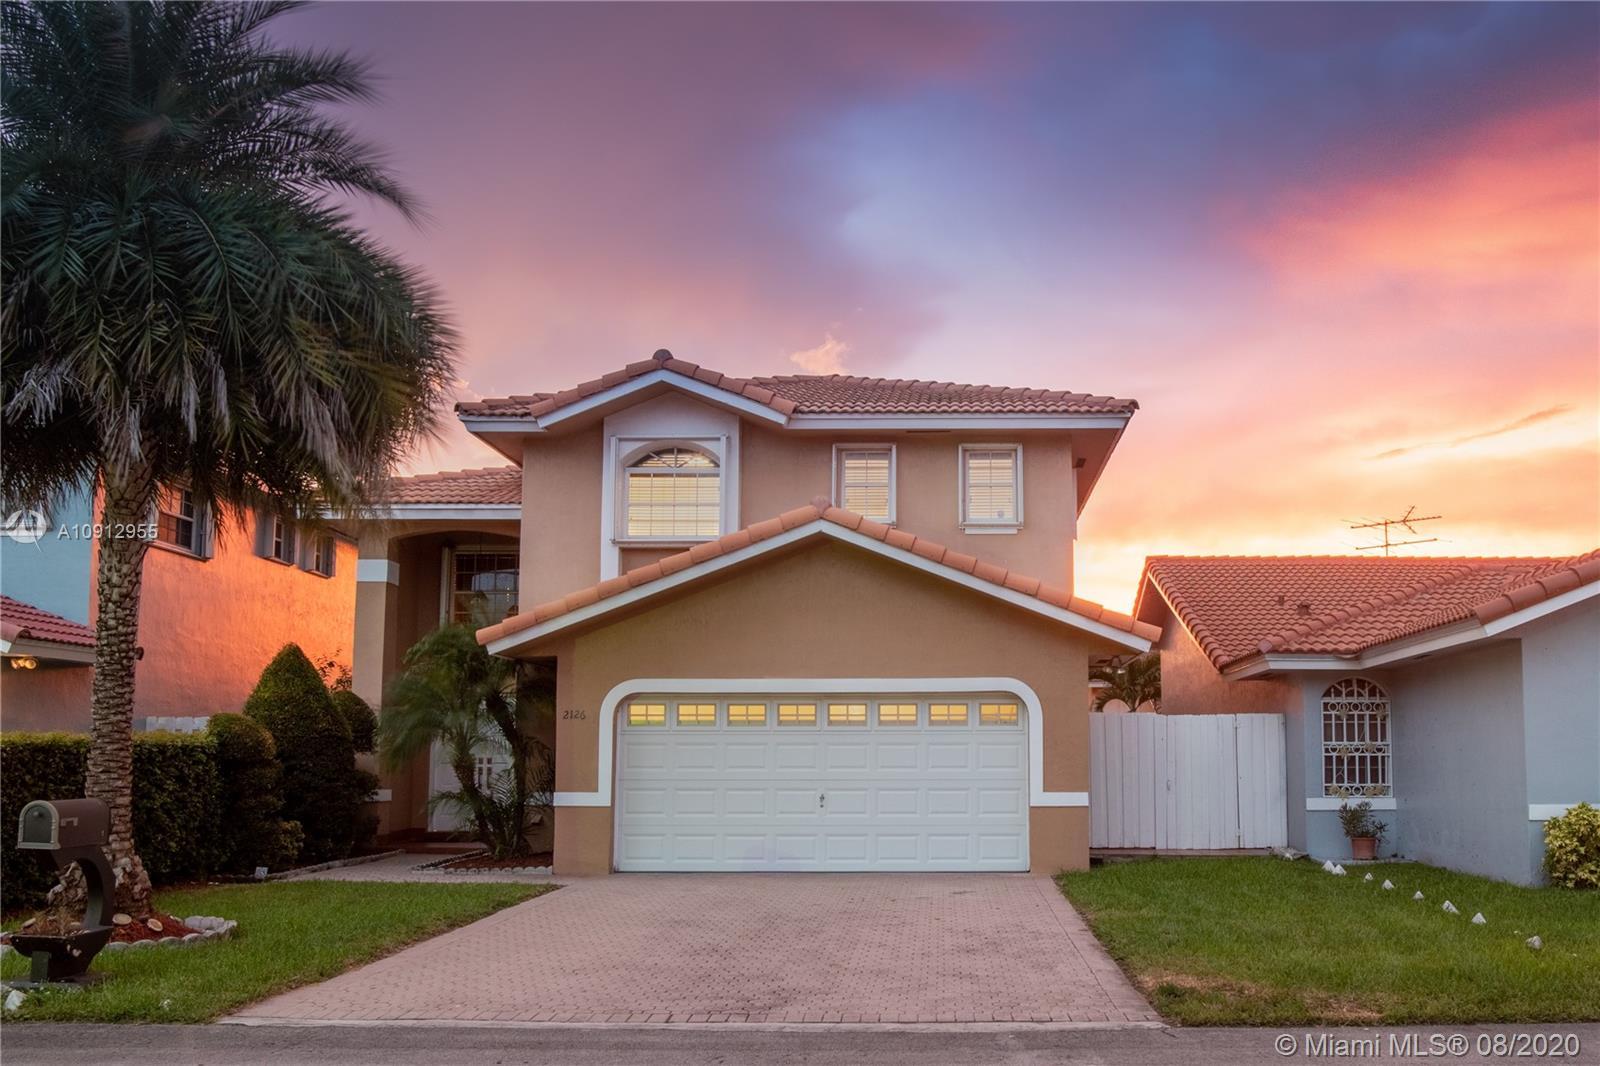 2126 SW 103rd Pl, Miami FL 33165